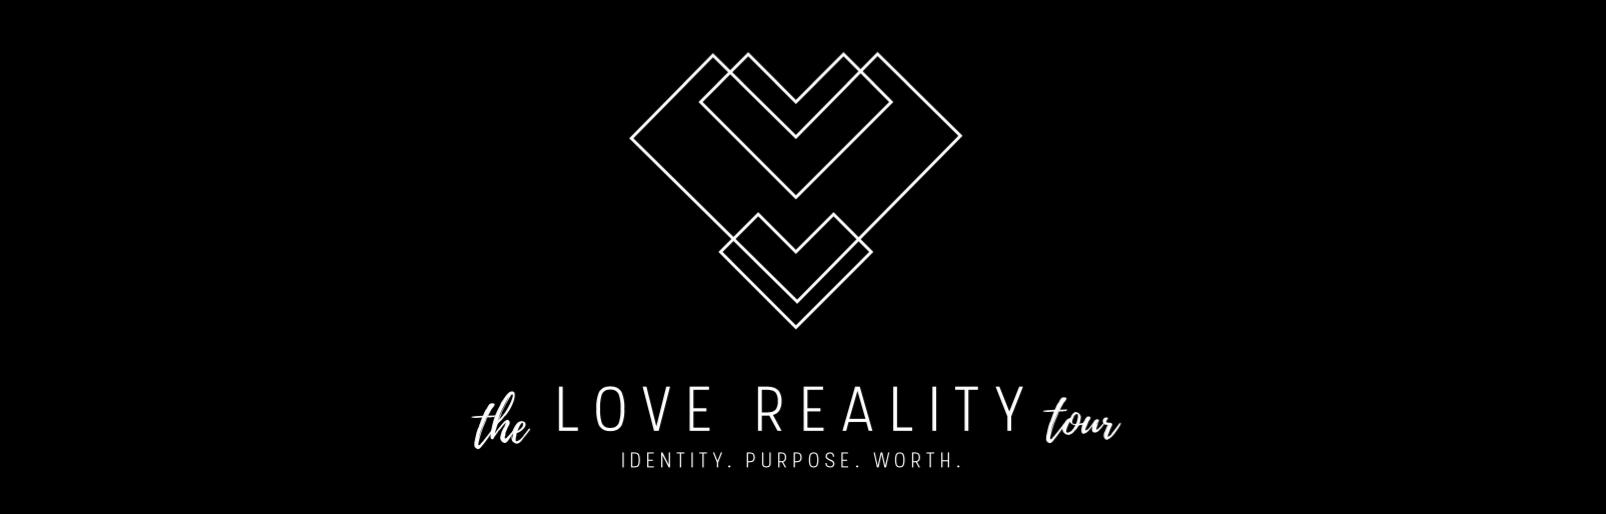 Love Reality Tour